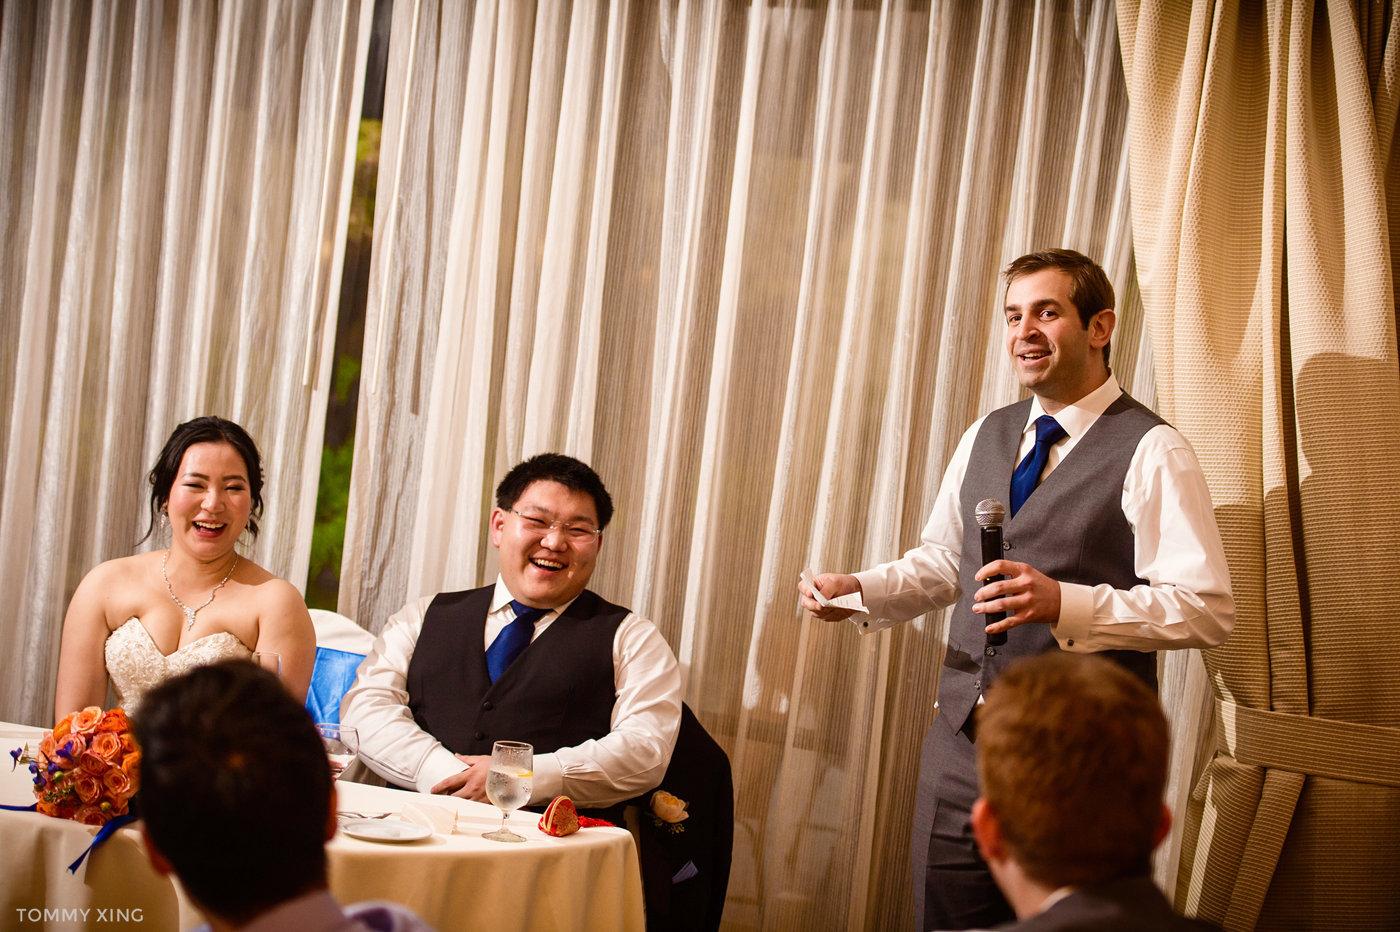 STANFORD MEMORIAL CHURCH WEDDING - Wenjie & Chengcheng - SAN FRANCISCO BAY AREA 斯坦福教堂婚礼跟拍 - 洛杉矶婚礼婚纱照摄影师 Tommy Xing Photography187.jpg